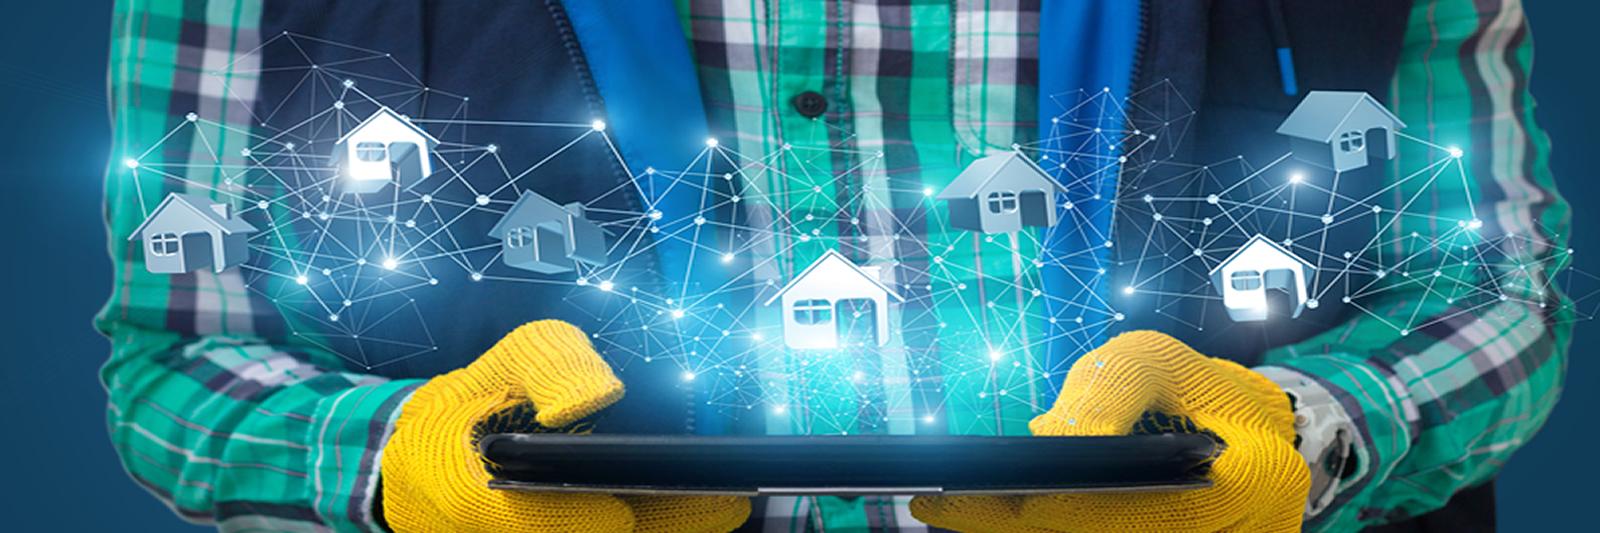 Fireworks-Smart-Home-Technology-HBA-2020.jpg